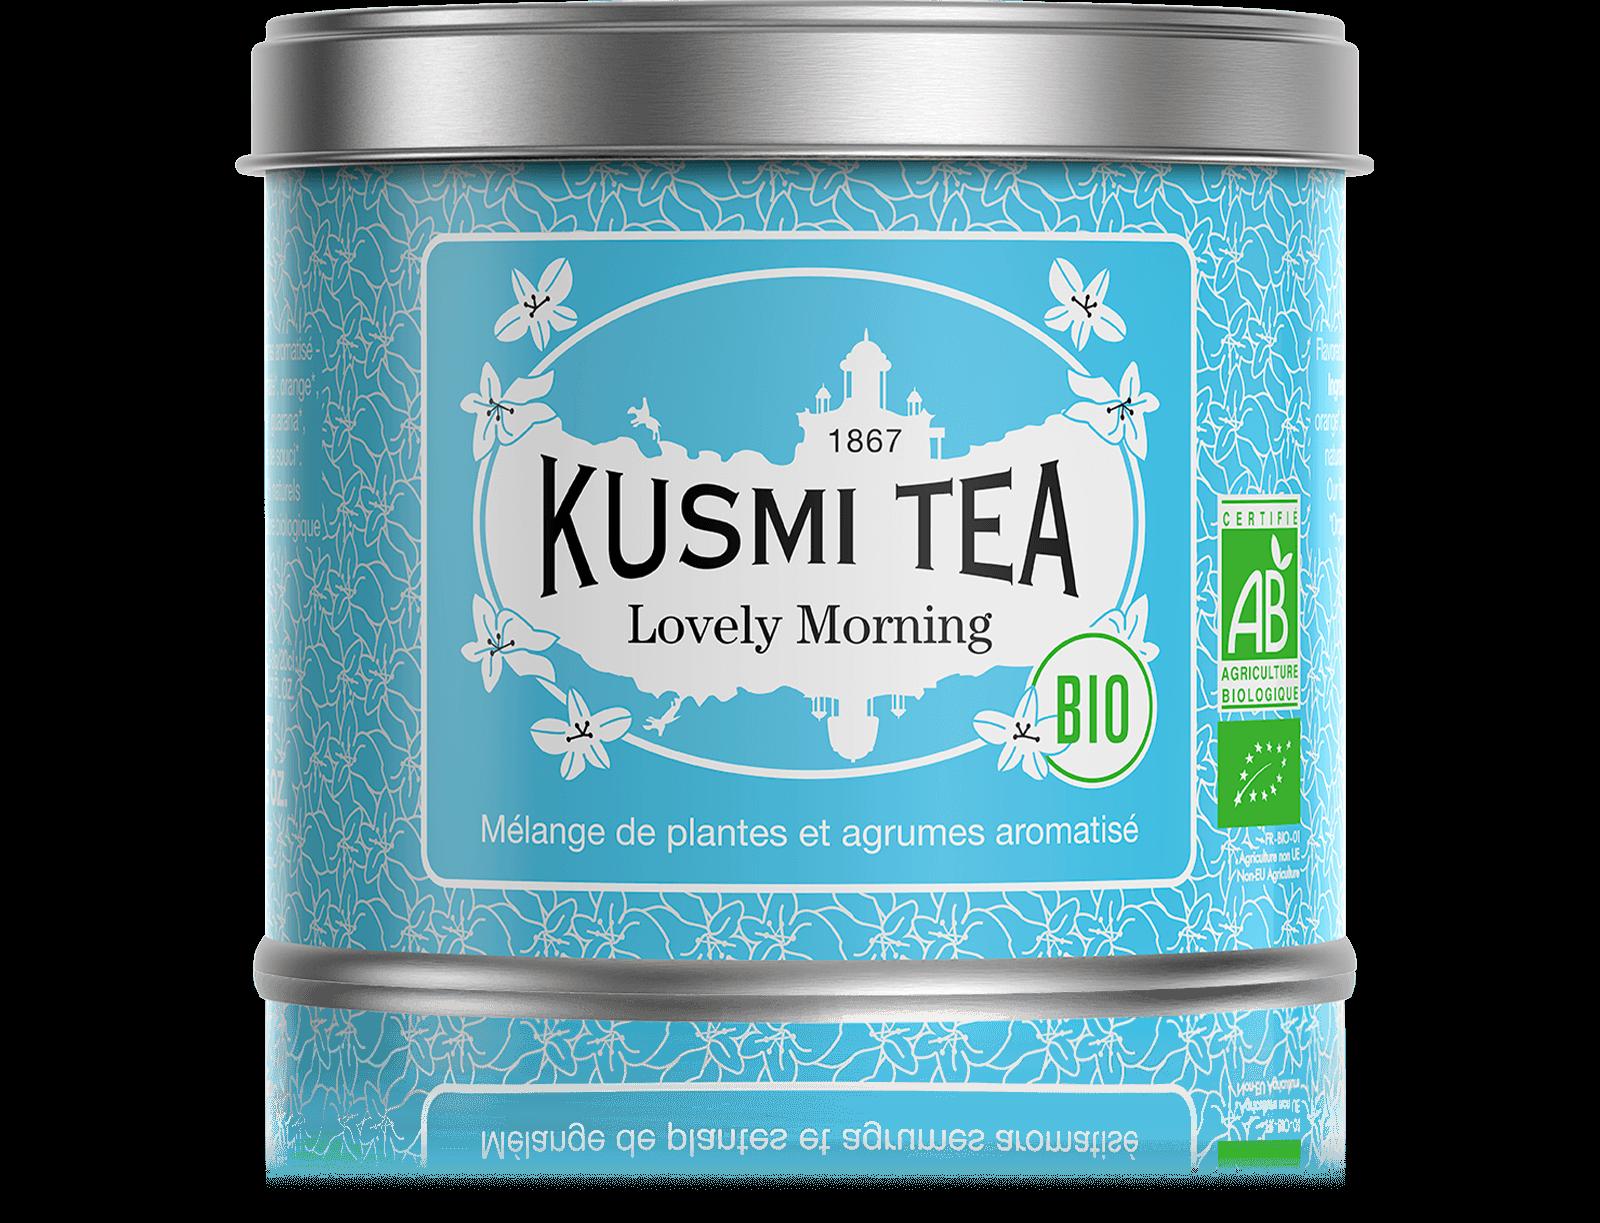 Thé vert, maté - Lovely Morning bio - Vrac - Kusmi Tea